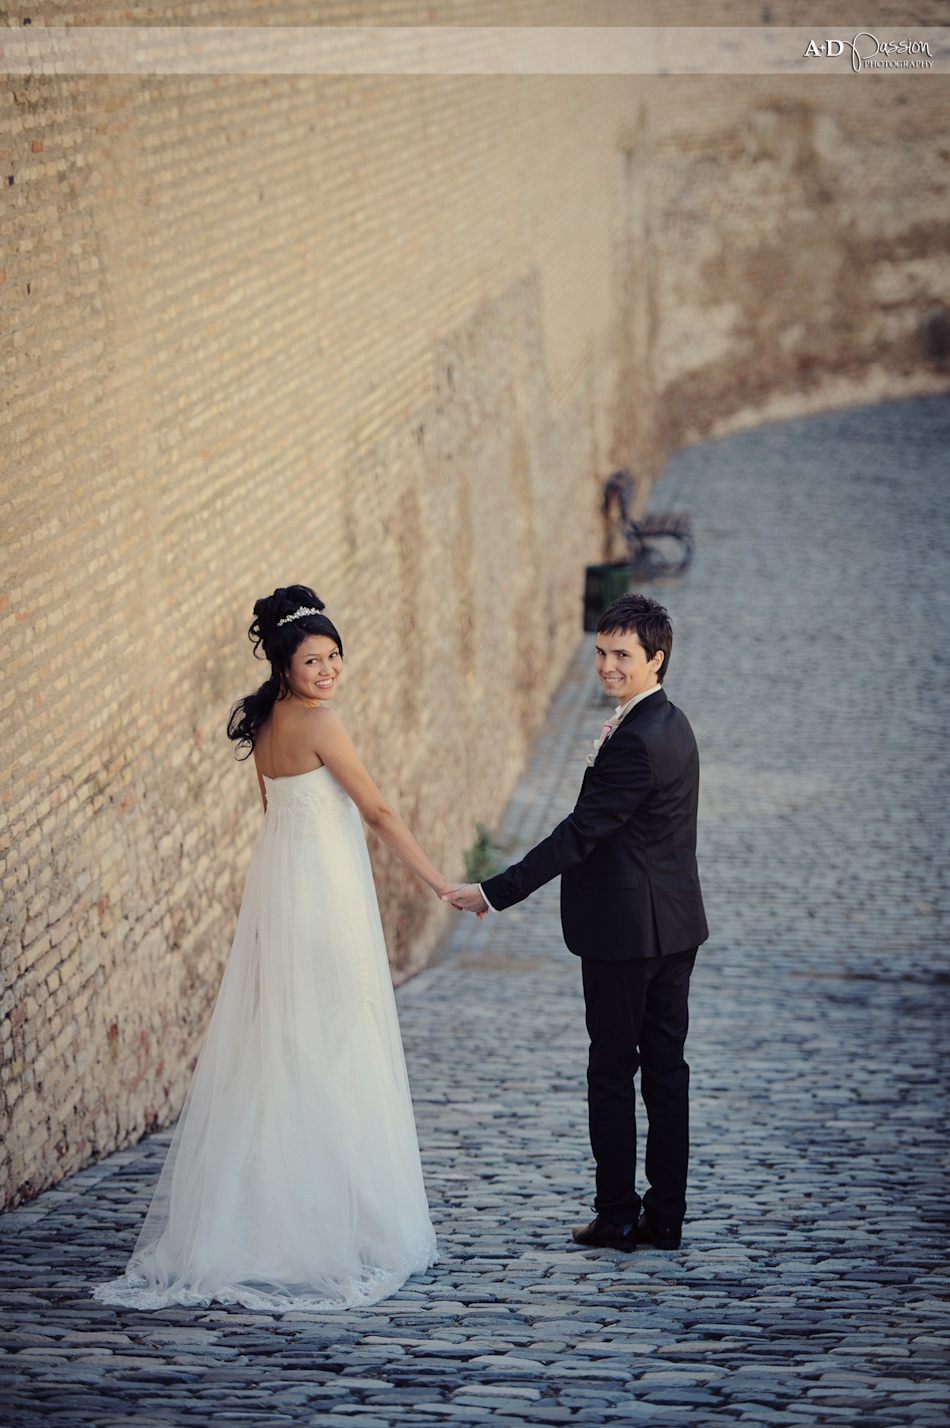 AD Passion Photography | 20120930_Gabriel&Iveth_Fotograf-profesionist-nunta_Nunta-Zaragoza-Spania_0028 | Adelin, Dida, fotograf profesionist, fotograf de nunta, fotografie de nunta, fotograf Timisoara, fotograf Craiova, fotograf Bucuresti, fotograf Arad, nunta Timisoara, nunta Arad, nunta Bucuresti, nunta Craiova